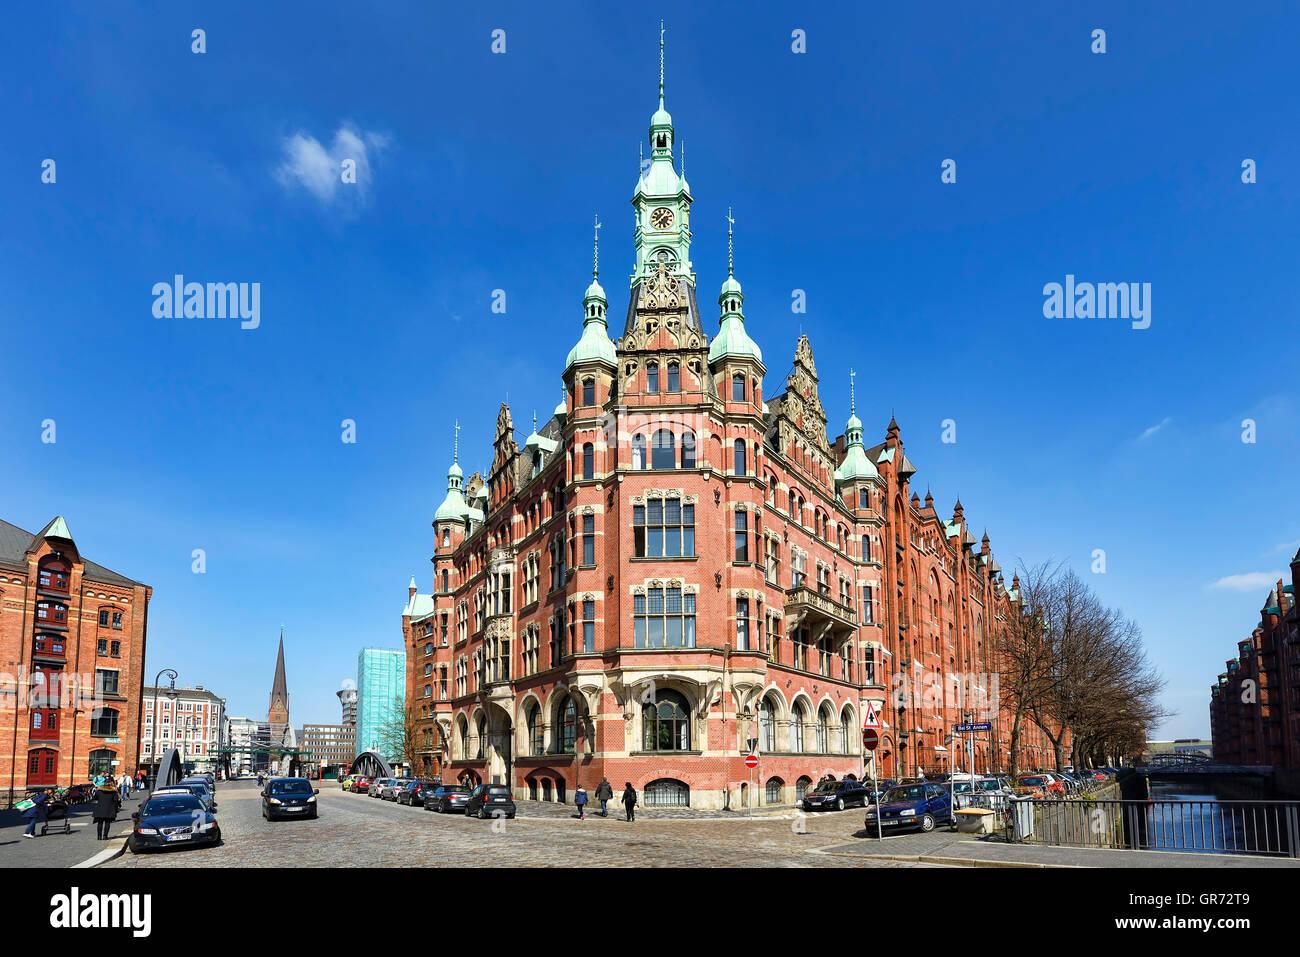 Warehouse District Speicherstadt In Hamburg, Germany - Stock Image